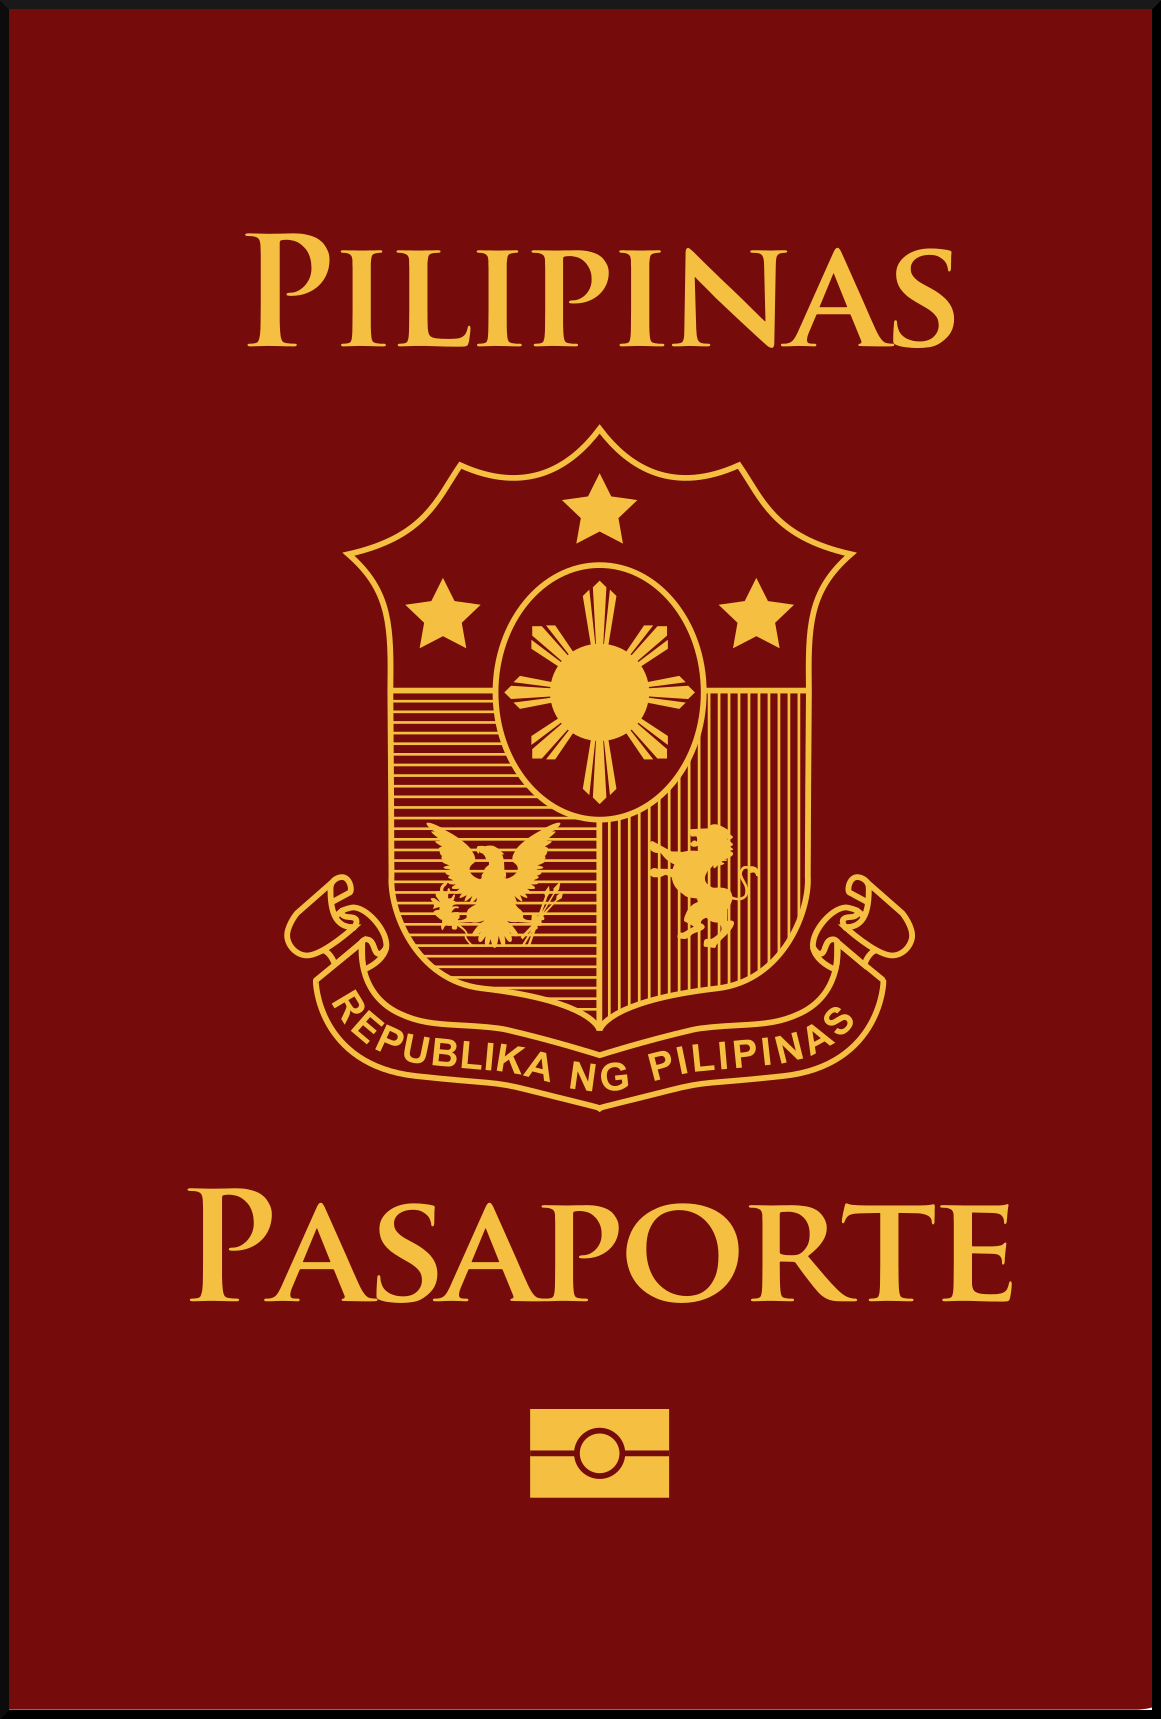 Паспорт Филиппин